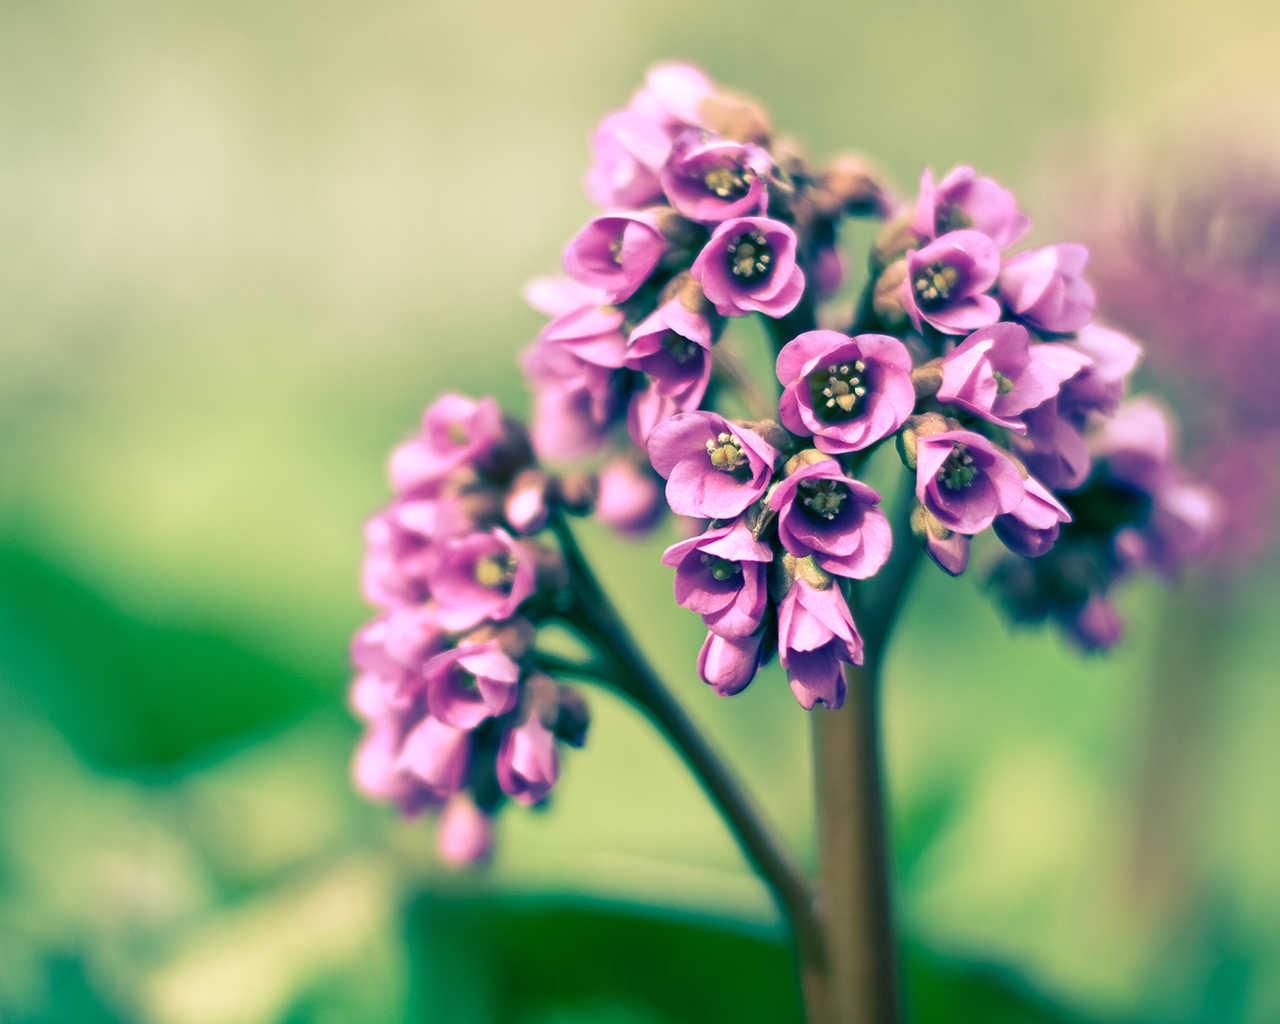 fondos de pantalla de flores de primavera Spanish HD Wallpapers